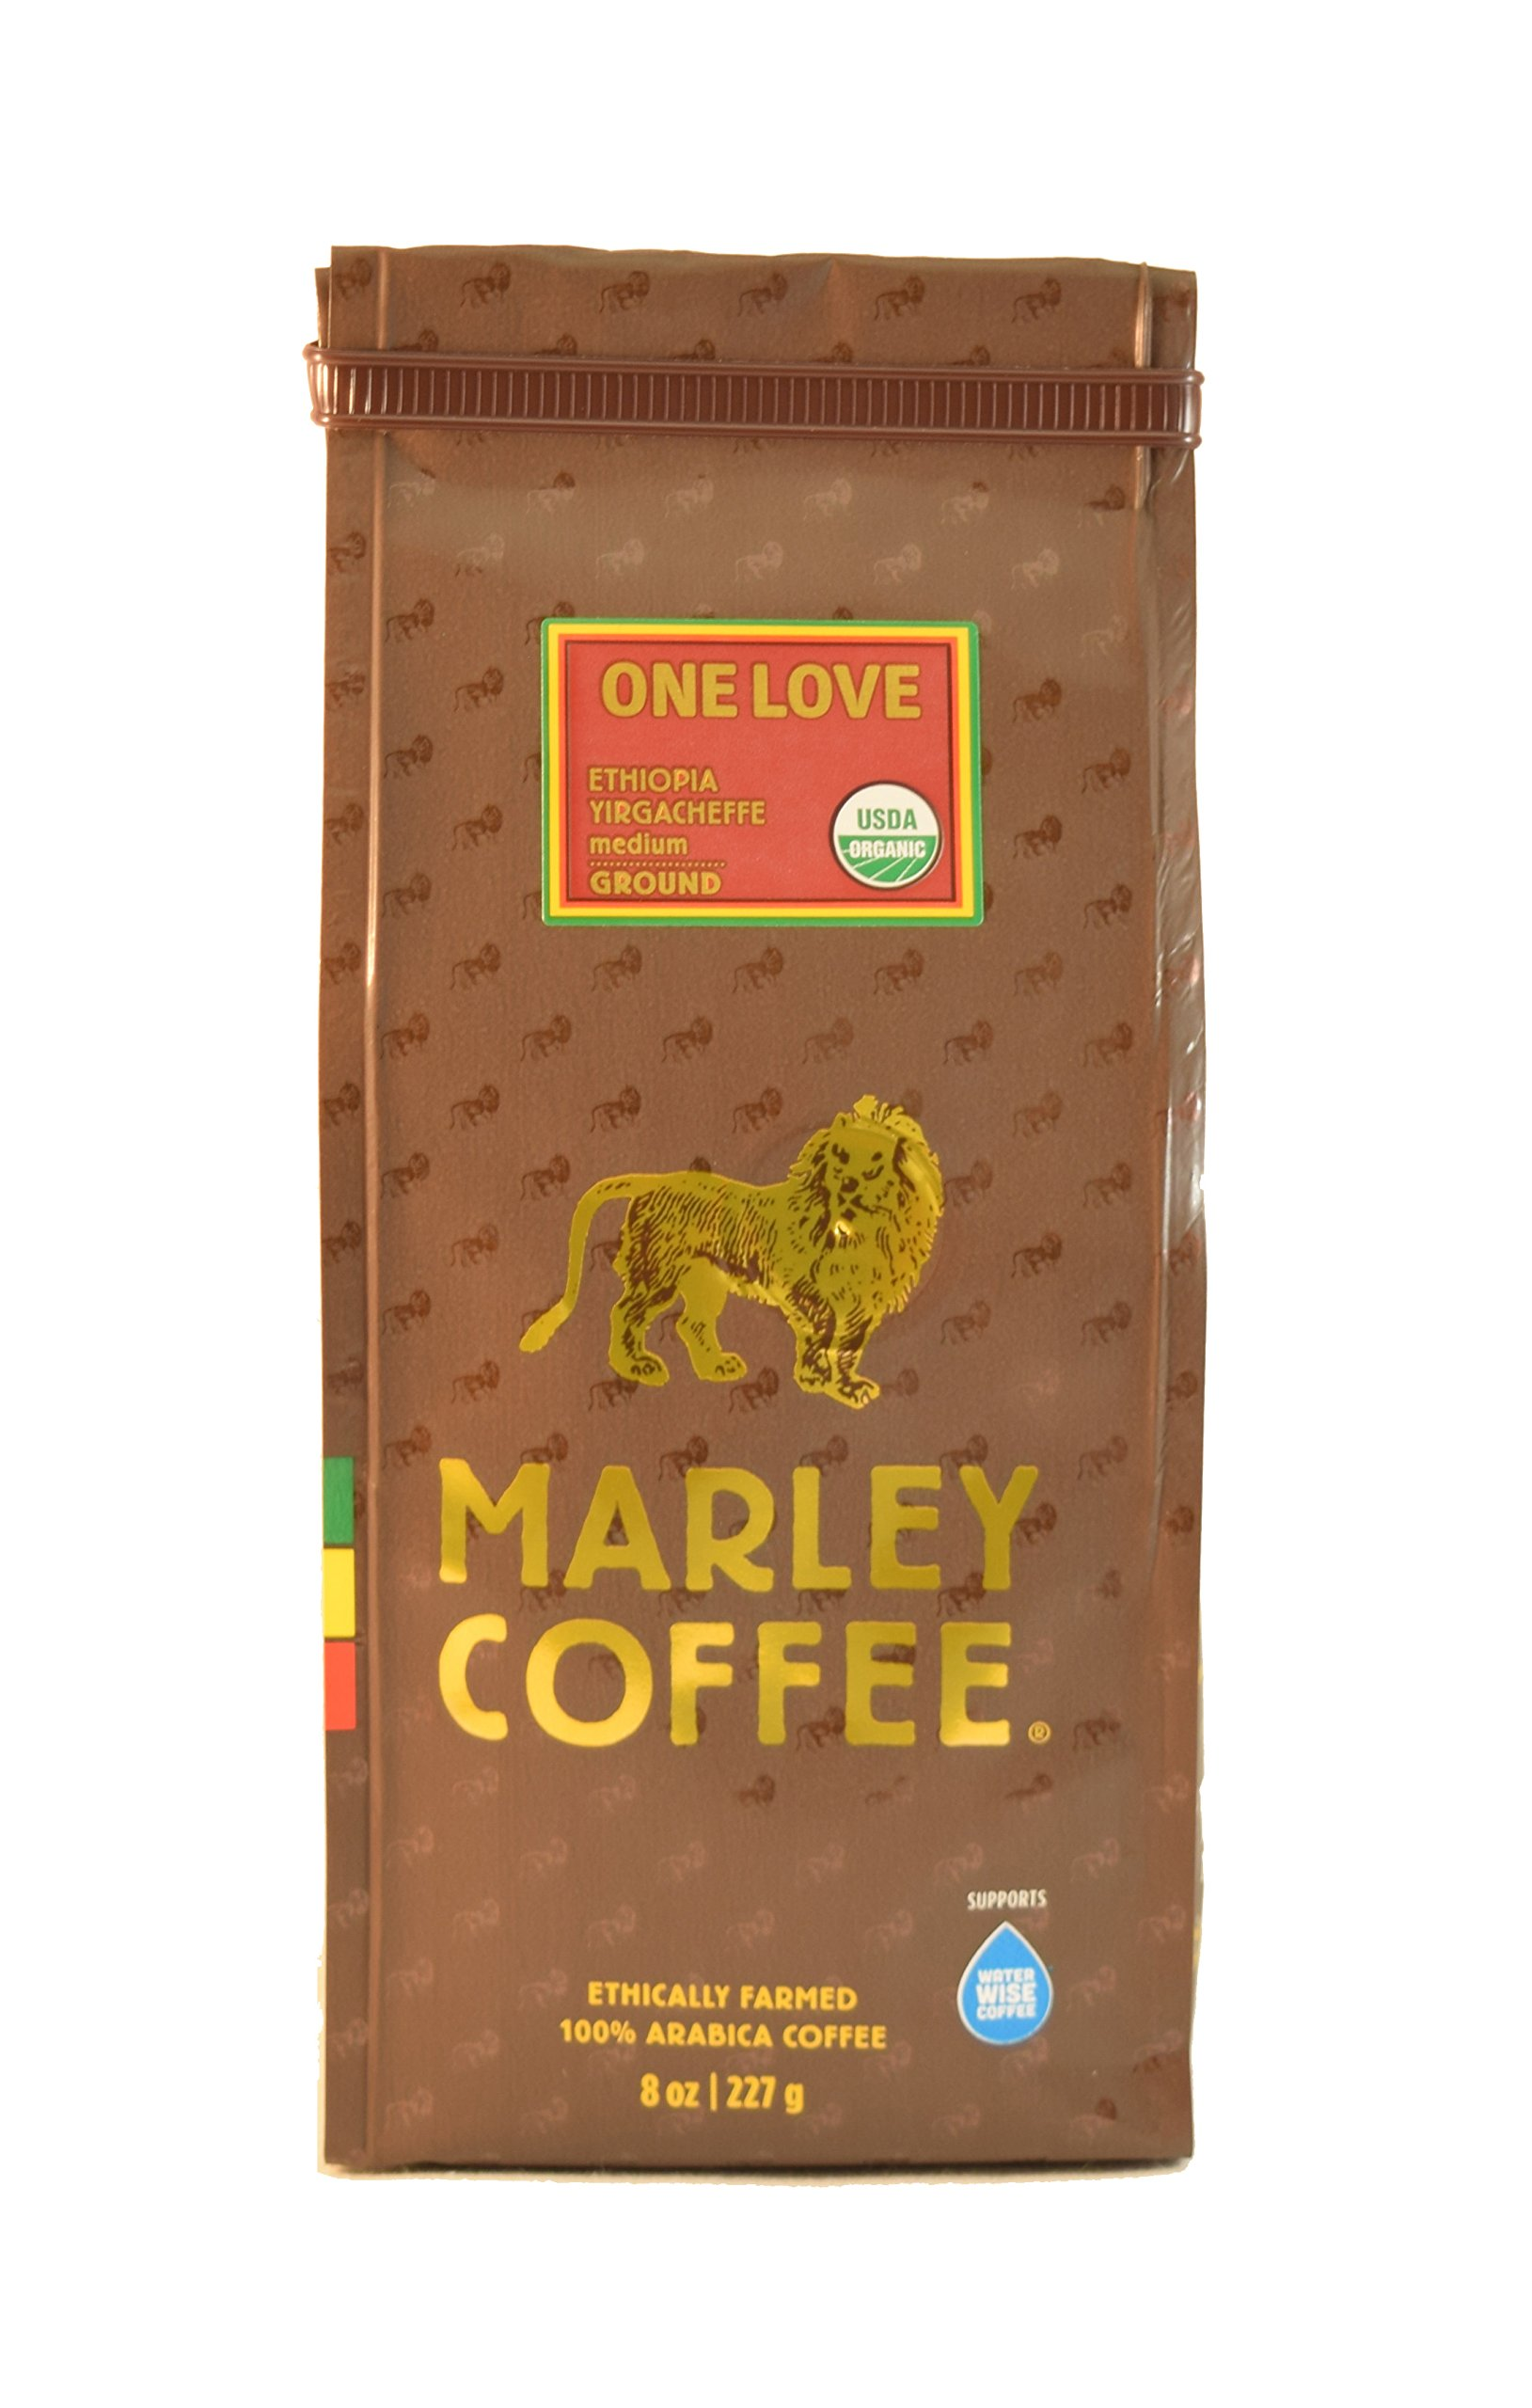 Marley Coffee, Organic One Love, Ethiopian YirgaCheffe, Ground Coffee, 8 Ounce